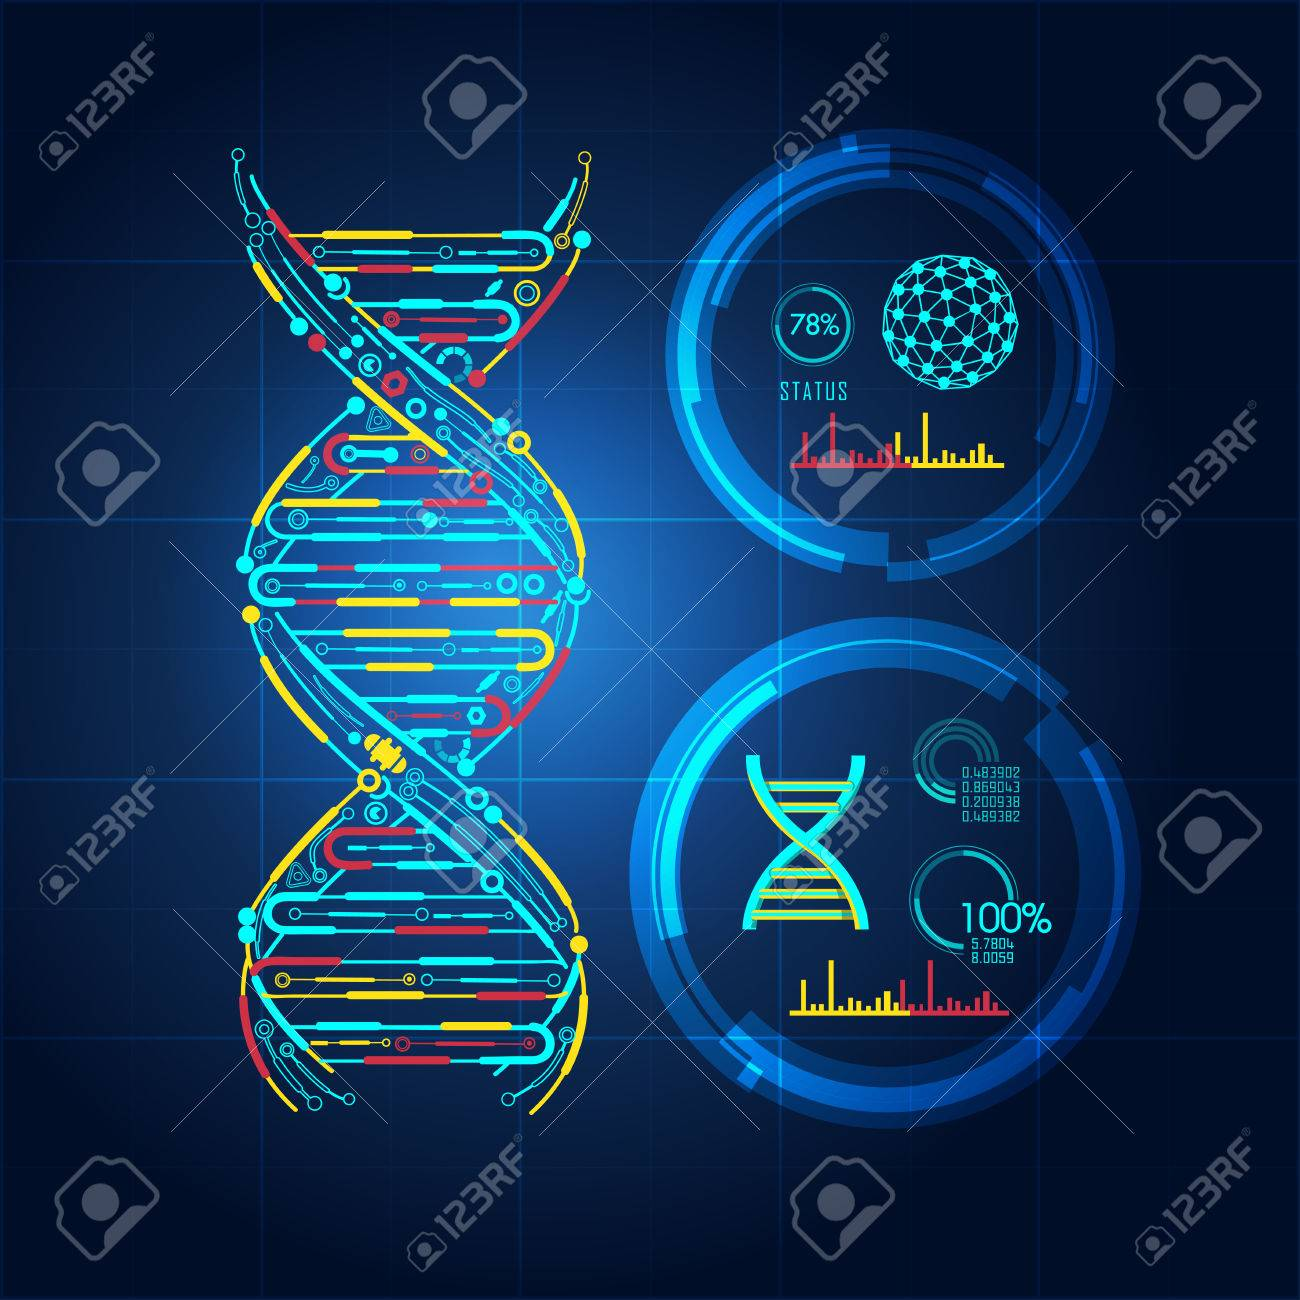 Blueprint of dna dna symbol in technological looks royalty free blueprint of dna dna symbol in technological looks stock vector 76678738 malvernweather Choice Image